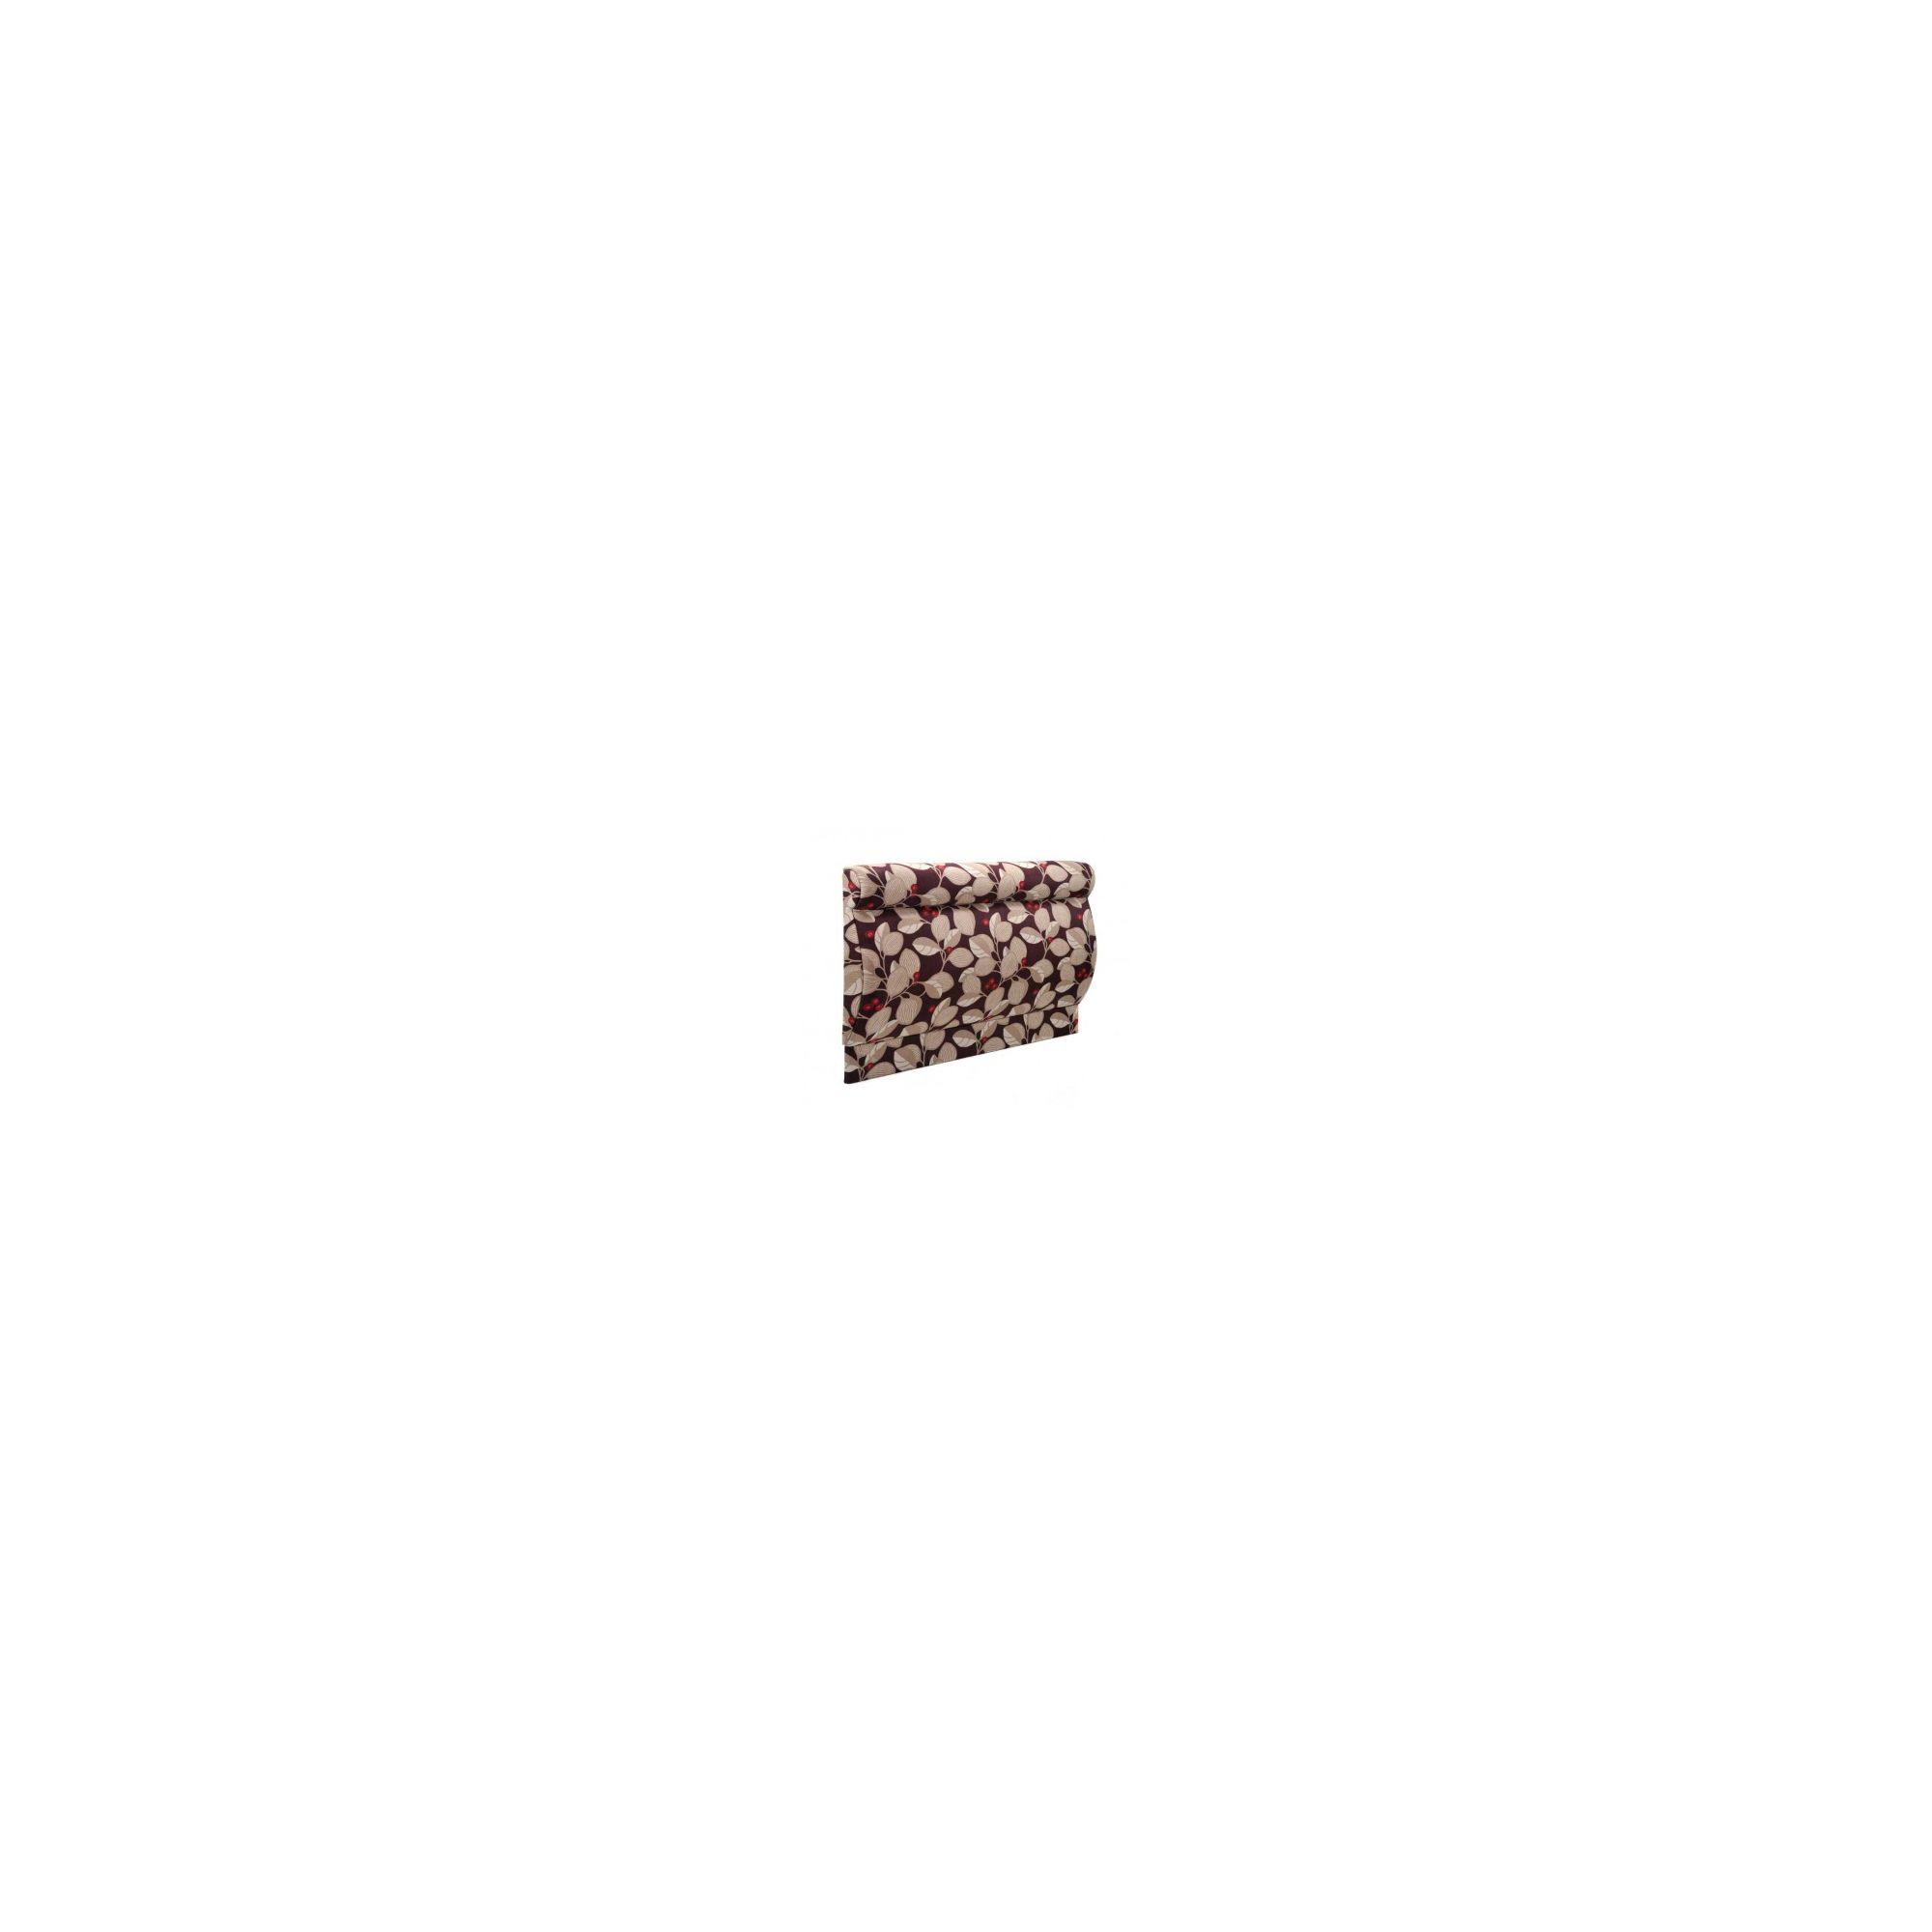 PC Upholstery Lima Headboard - Cream - 3' Single at Tesco Direct